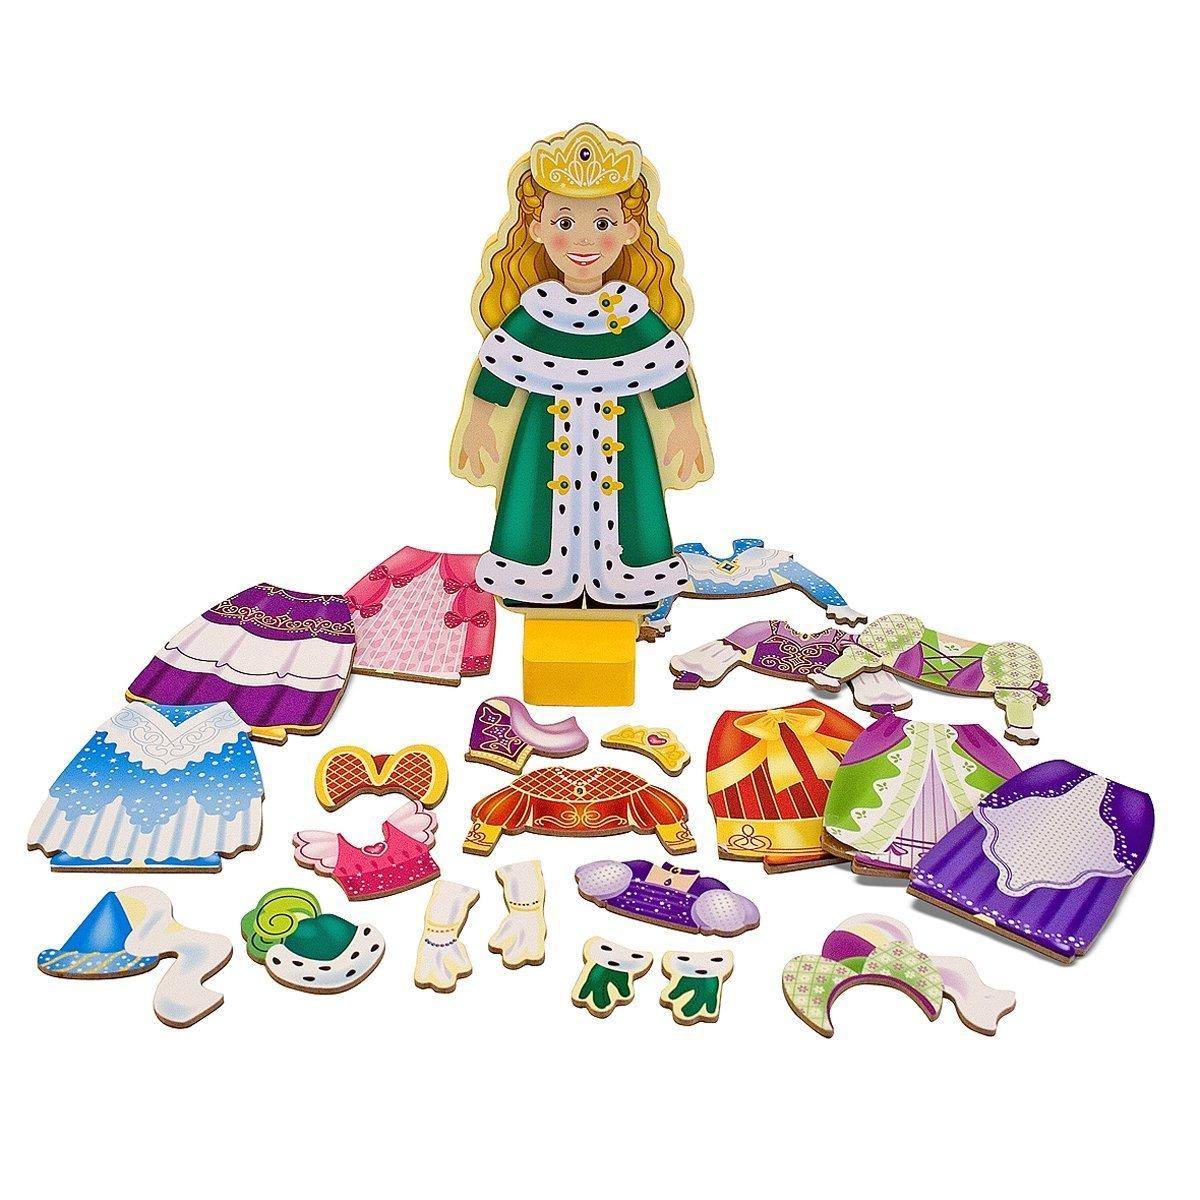 Melissa & Doug Princess Elise - Magnetic Dress Up Wooden Doll & Stand + FREE Scratch Art Mini-Pad Bundle [35538] by Melissa & Doug